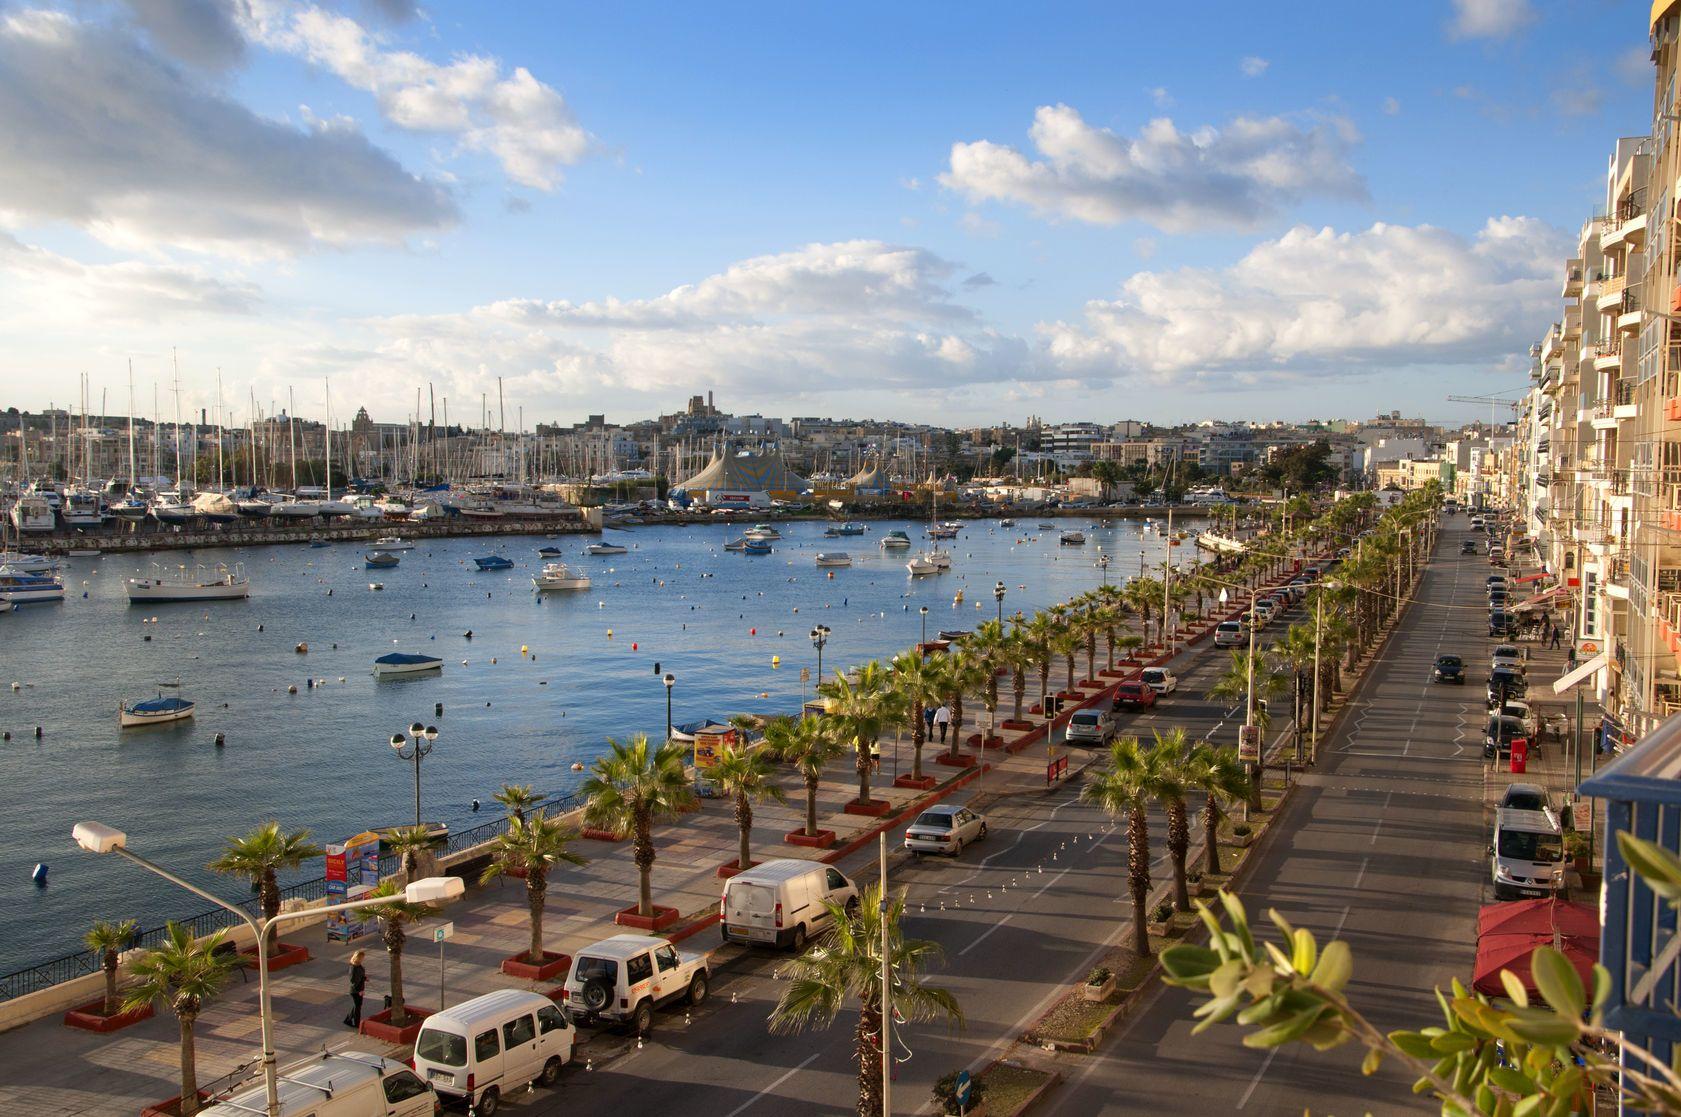 Promenáda na středomořském ostrově Malta | quasargal/123RF.com